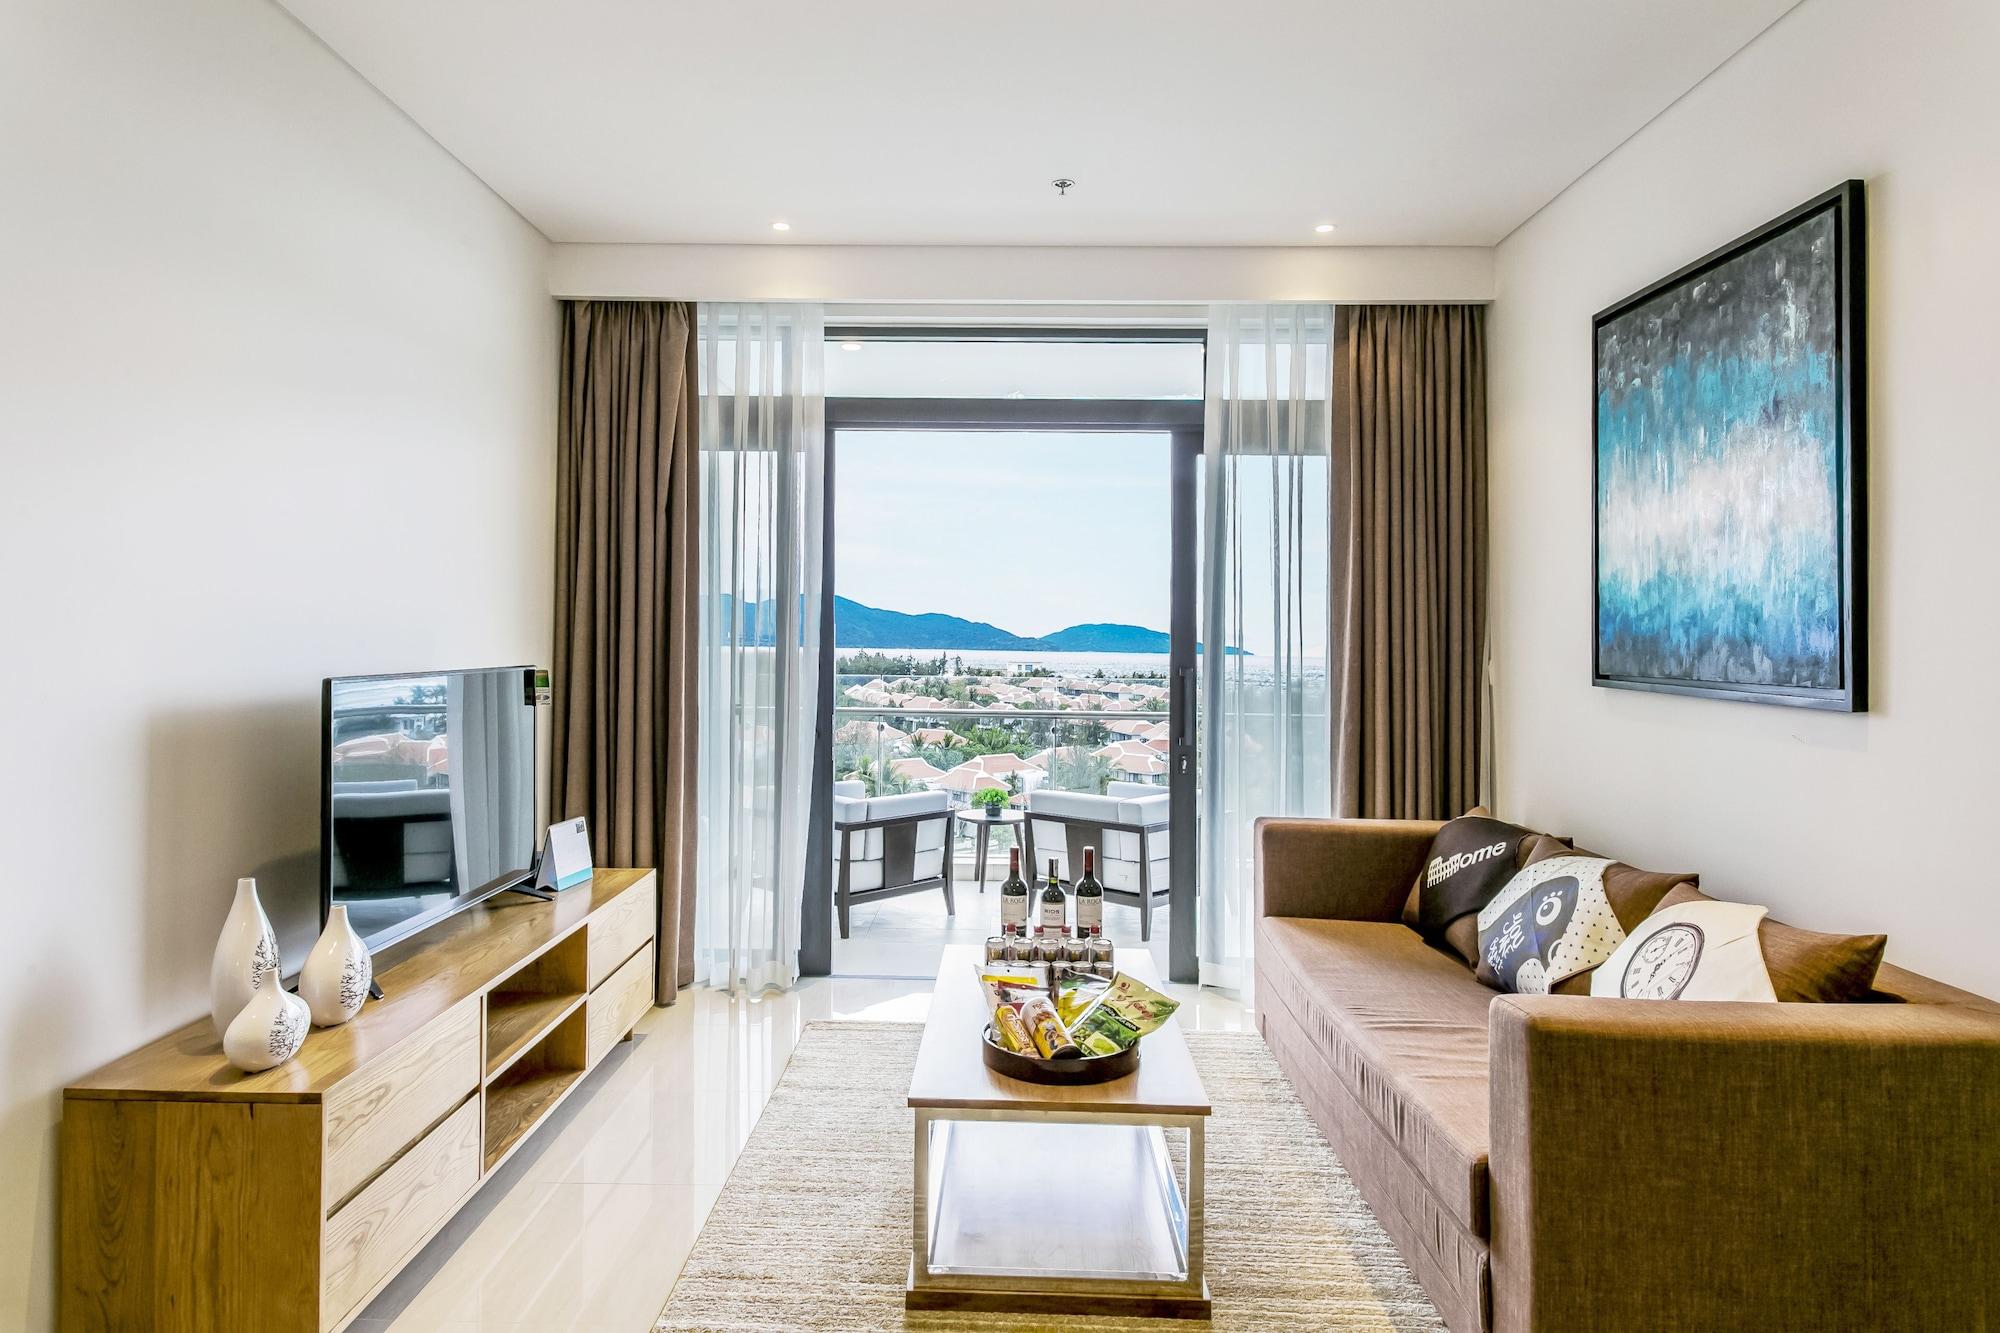 Zoneland Premium-The Ocean-Point Villa, Ngũ Hành Sơn